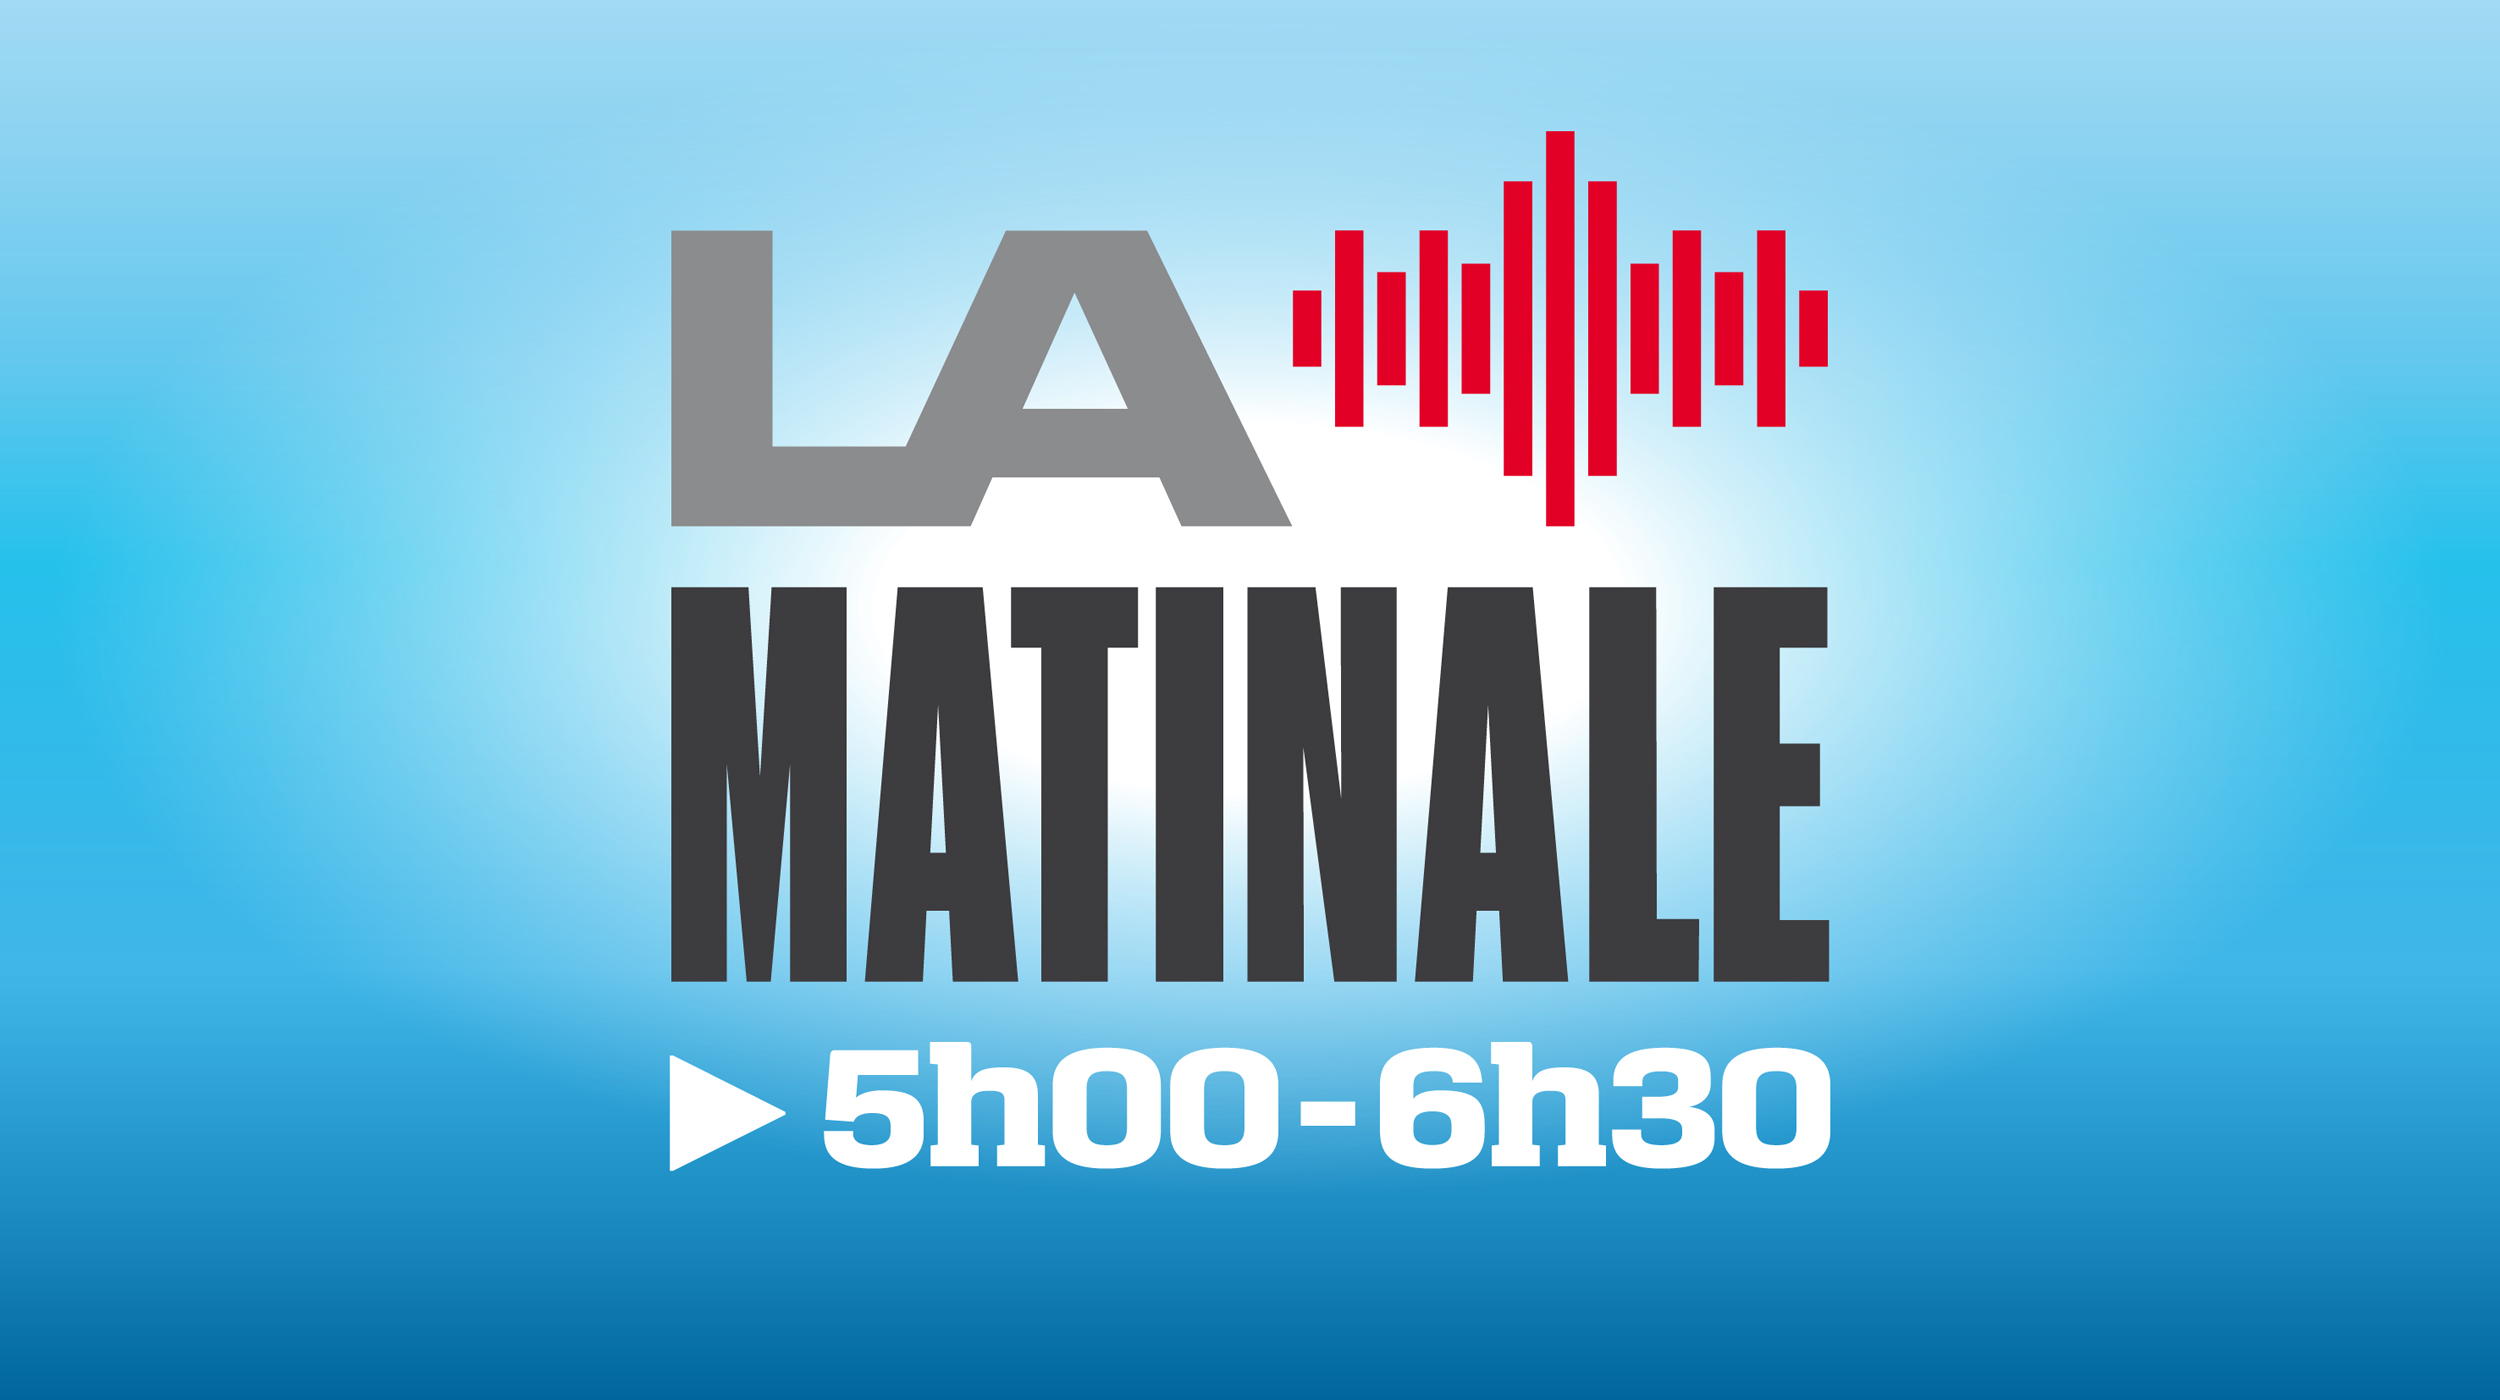 LOGO Matinale 5h 6h30 2500x1400 [RTS]